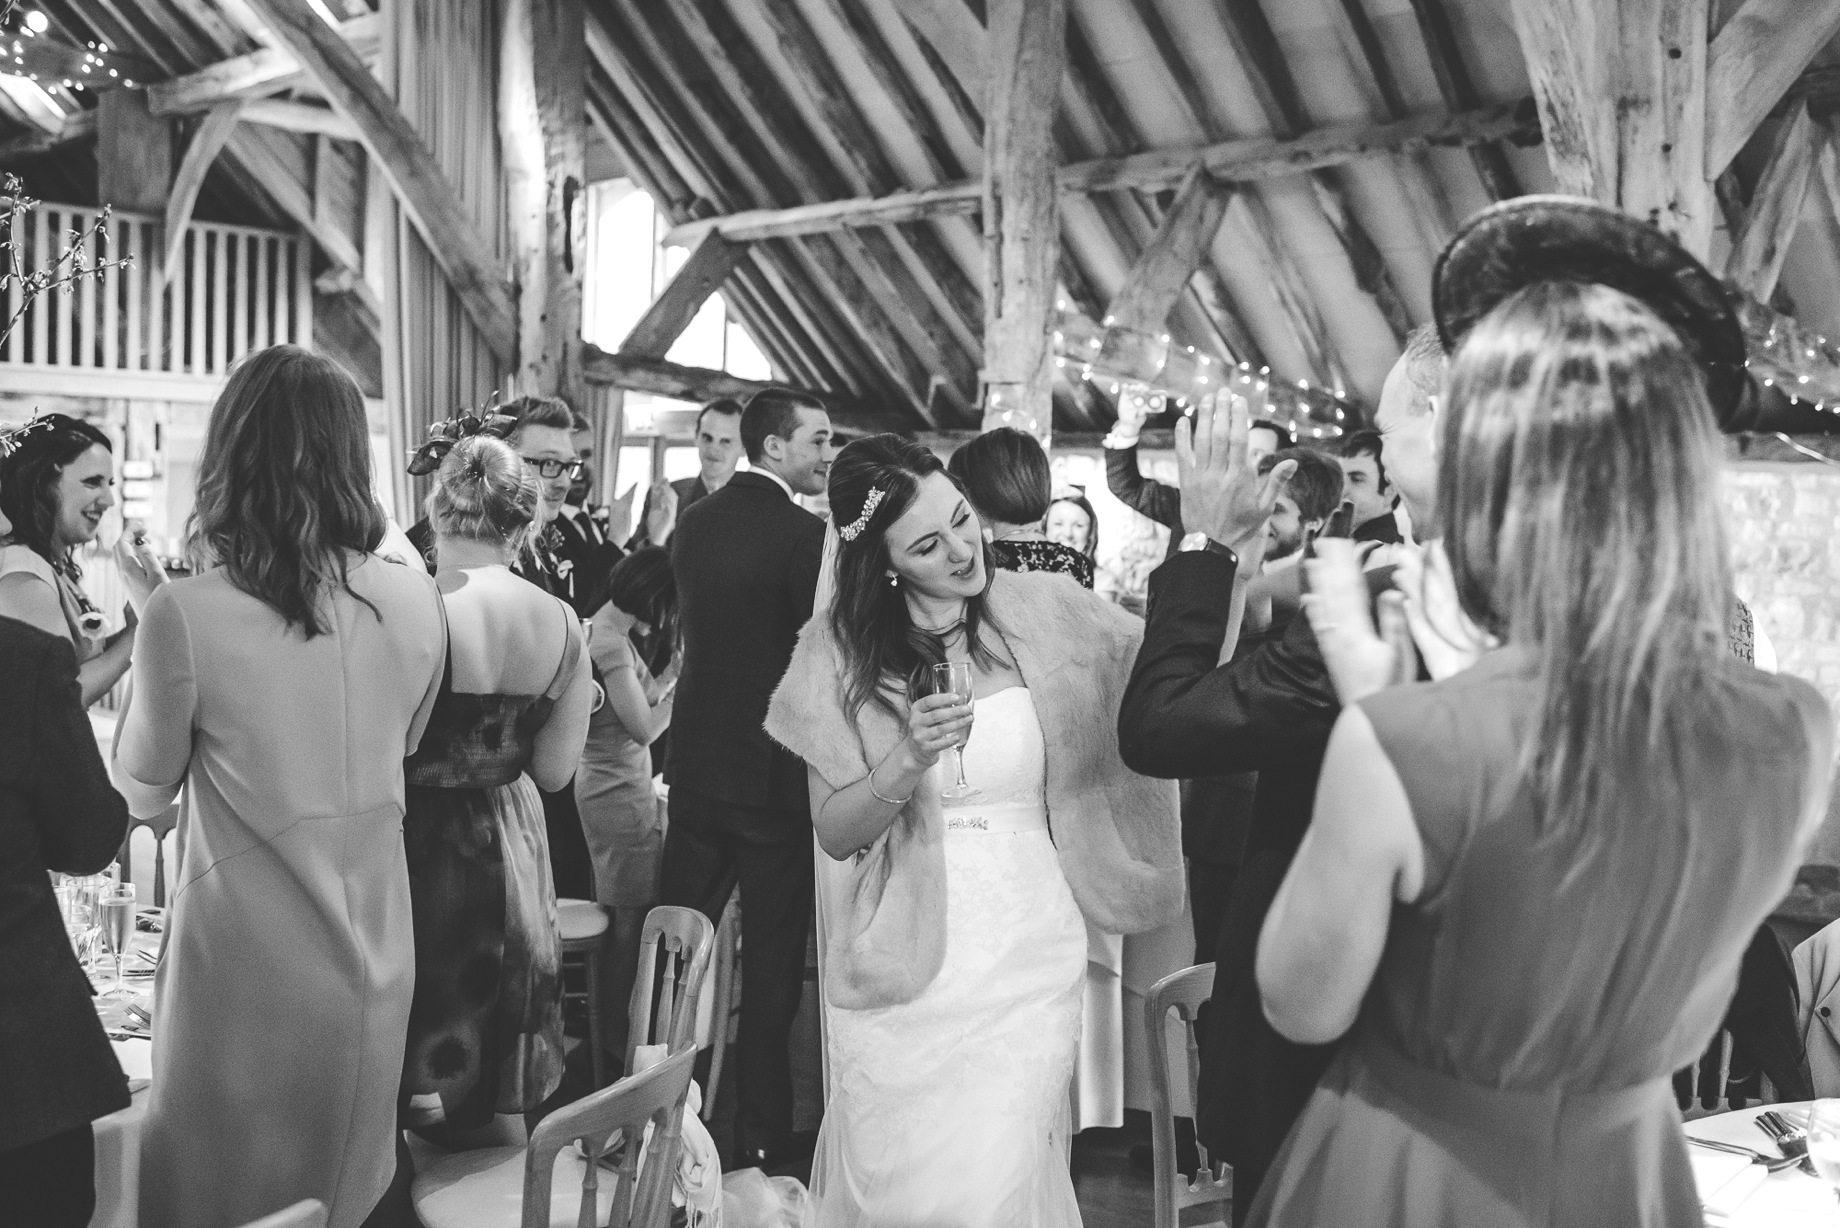 Heather and Chris - Hampshire wedding photography (129 of 174)